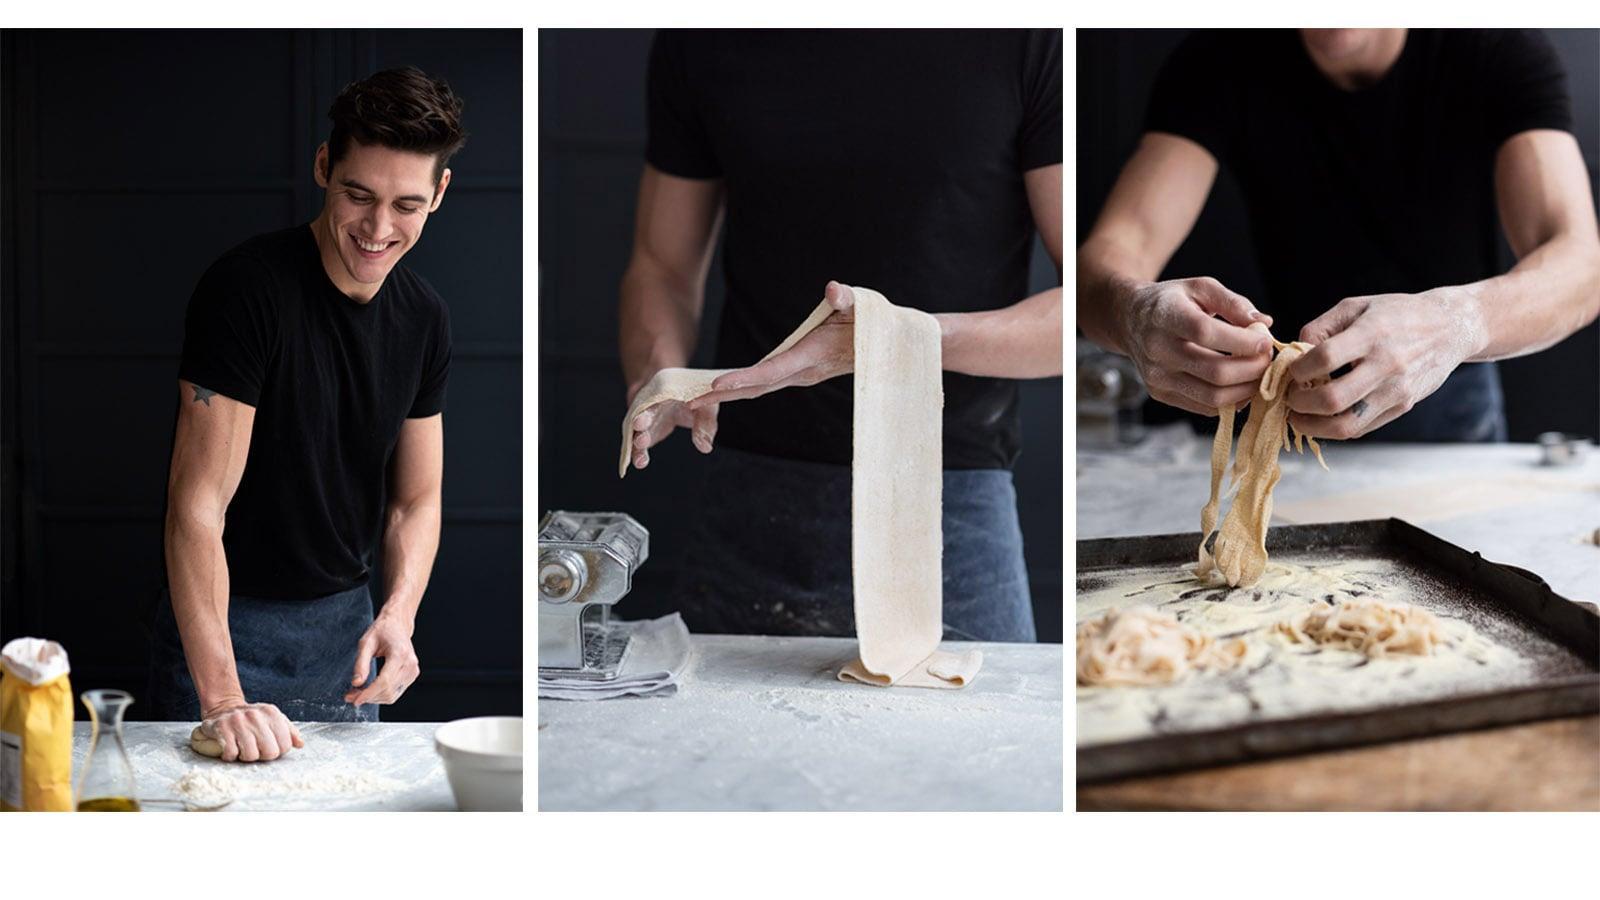 Issac Carew making fresh pasta